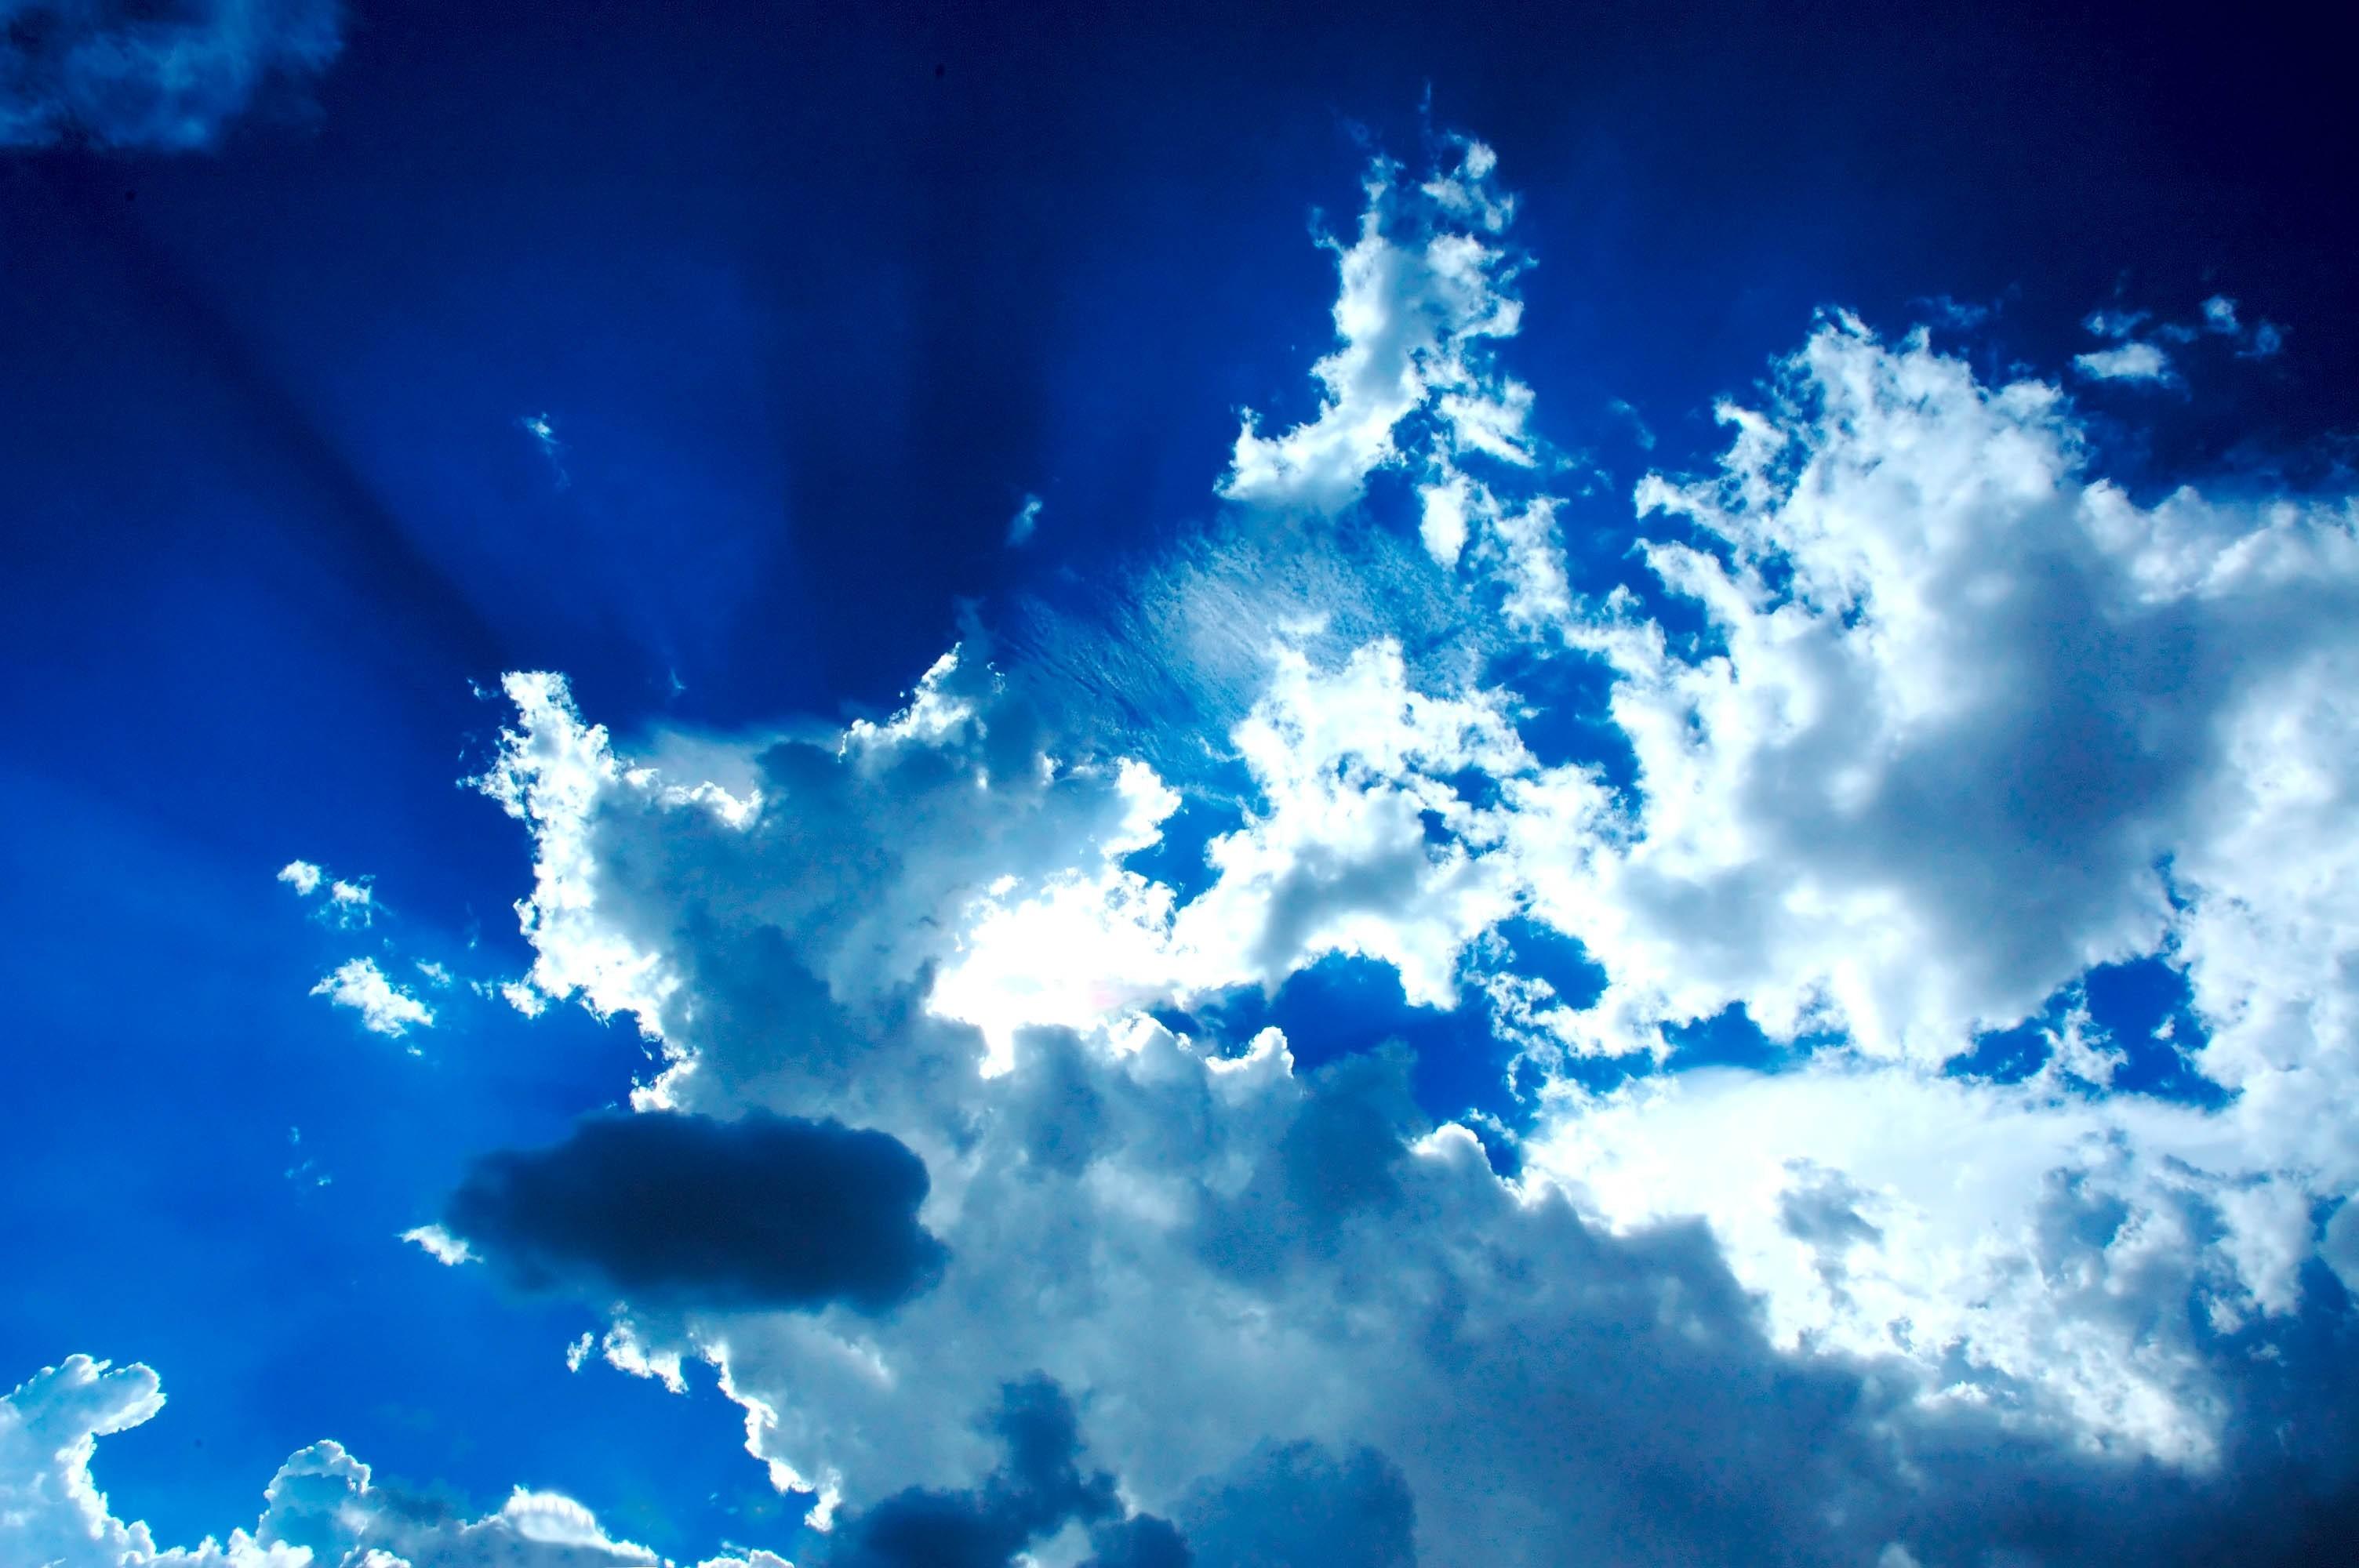 Облака в голубом небе  № 1665946 без смс